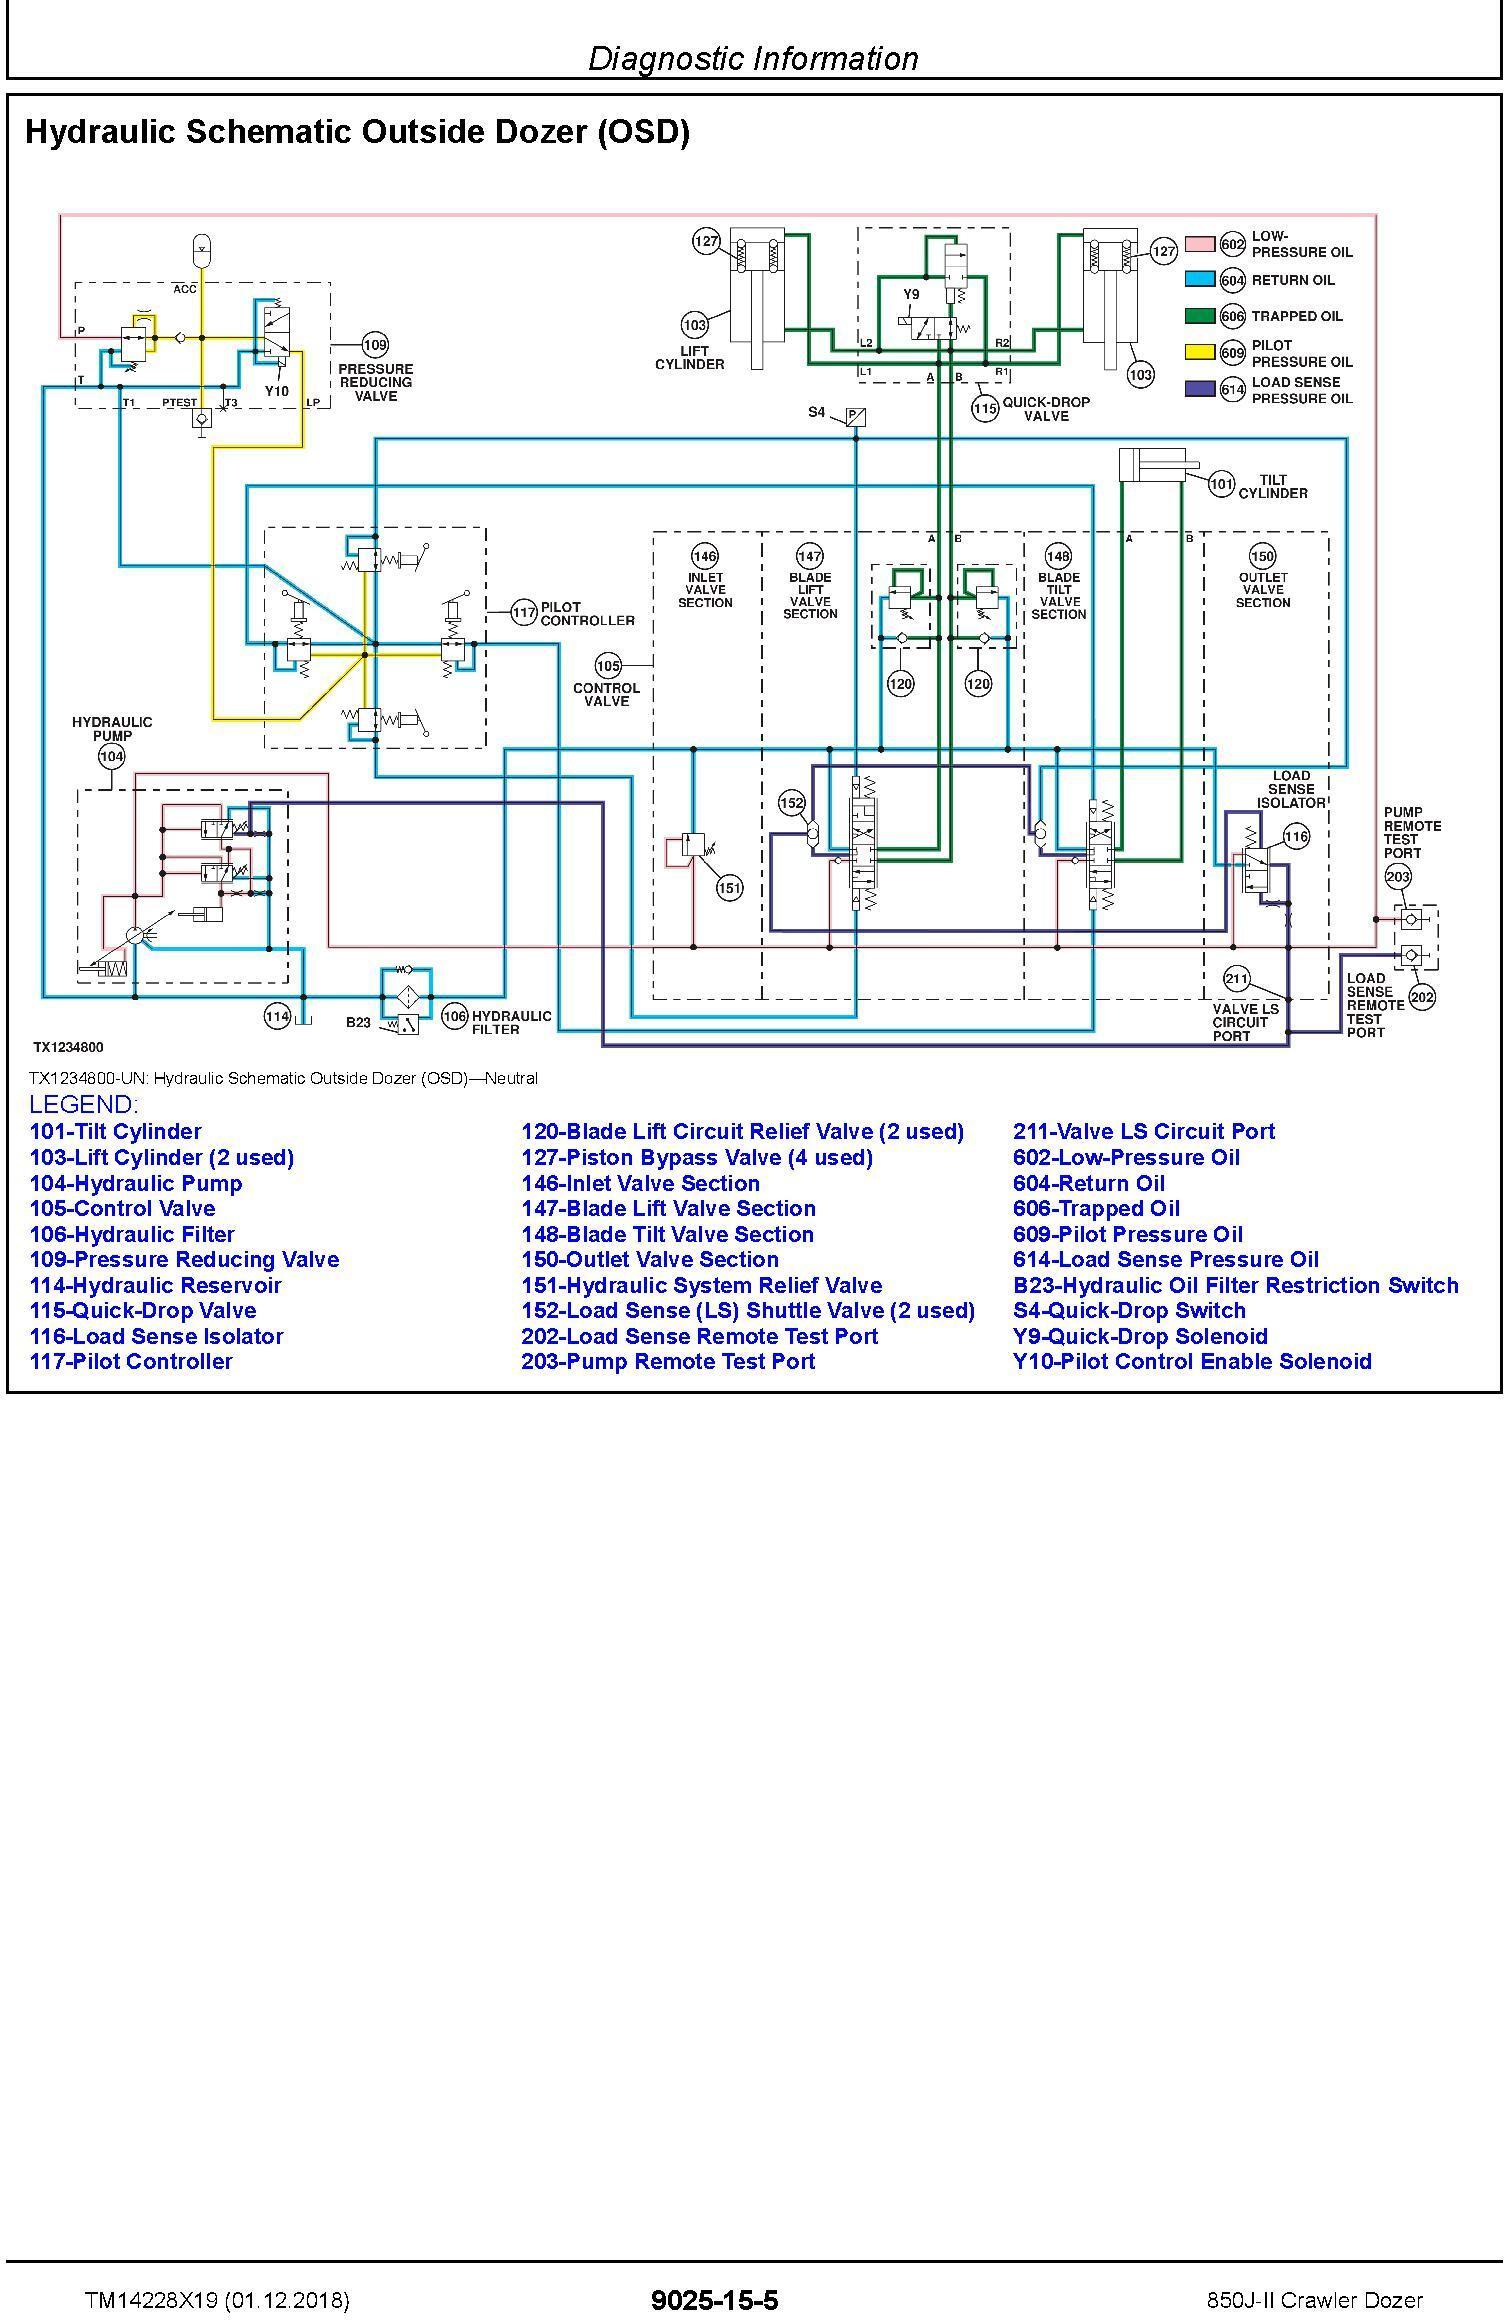 John Deere 850J-II (SN. C306799-354851) Crawler Dozer Operation & Test Technical Manual (TM14228X19) - 2